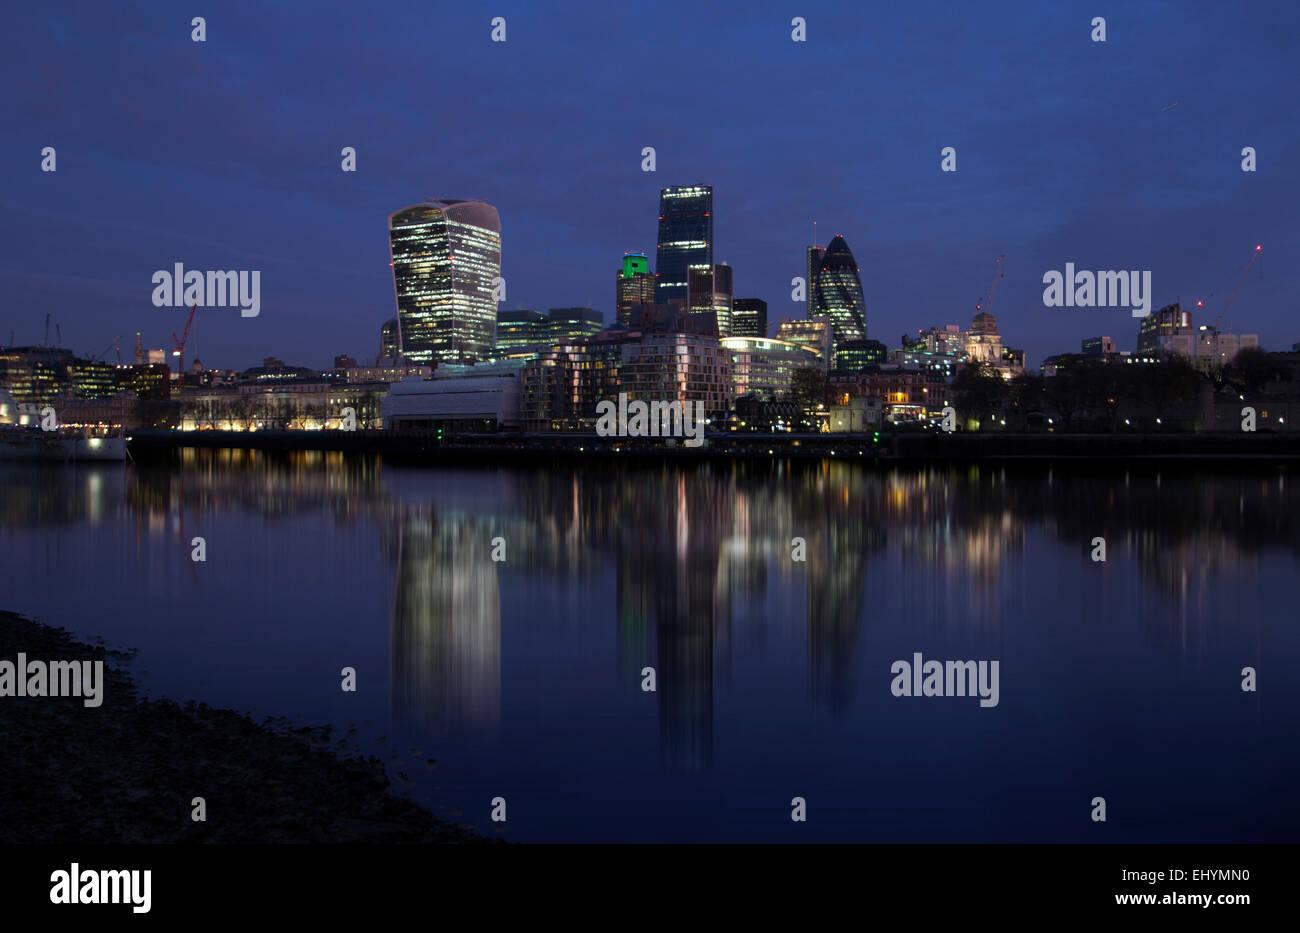 The Square Mile at night, London, UK - Stock Image